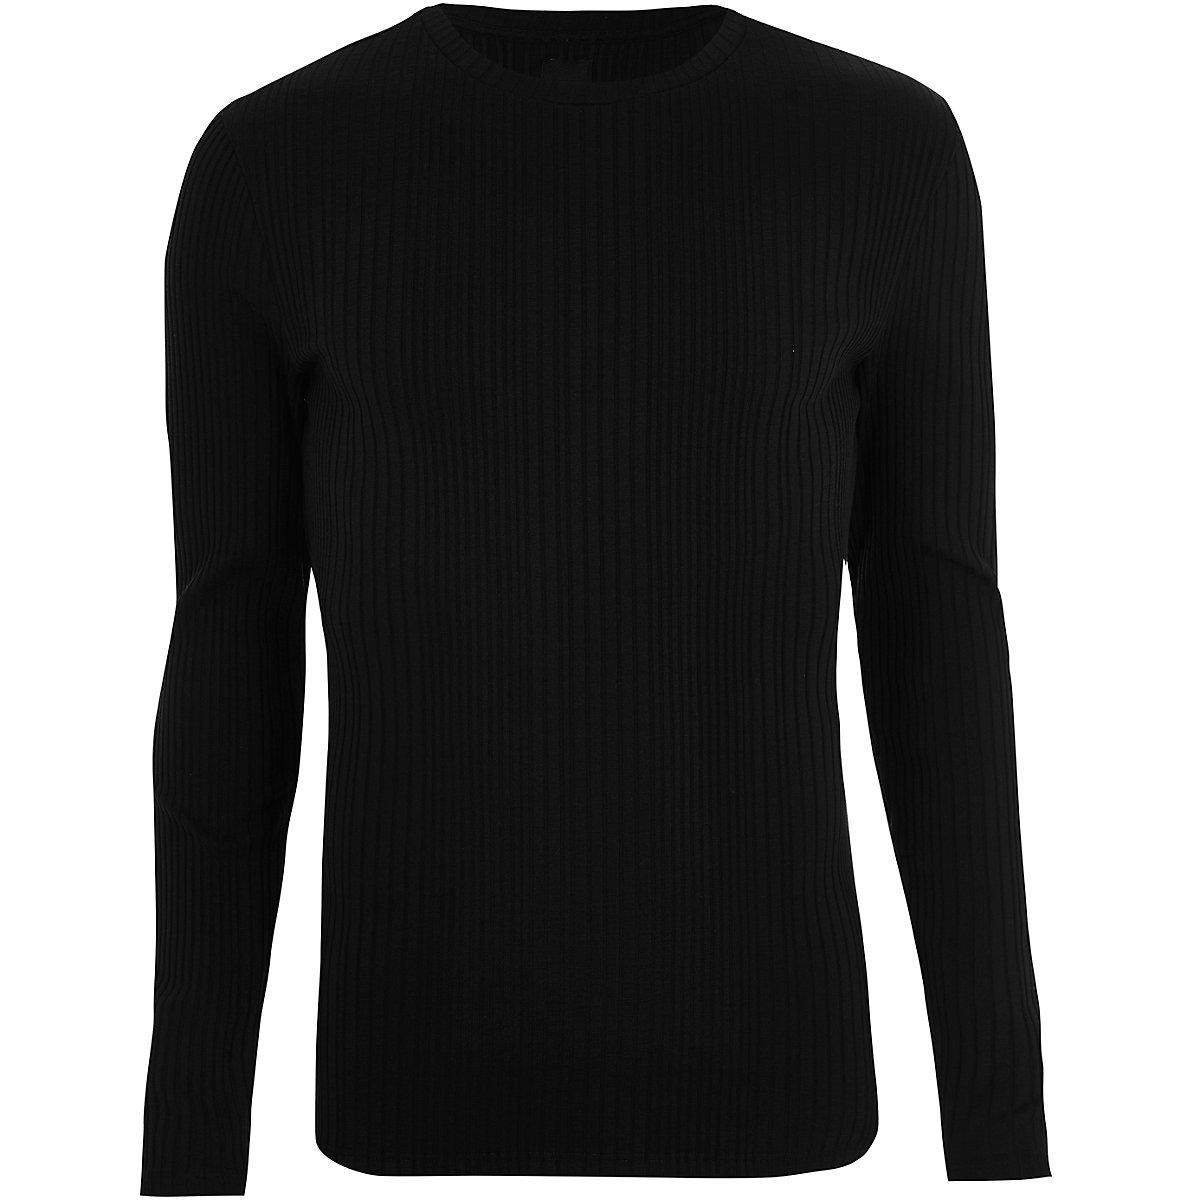 Black ribbed long sleeve knit T-shirt